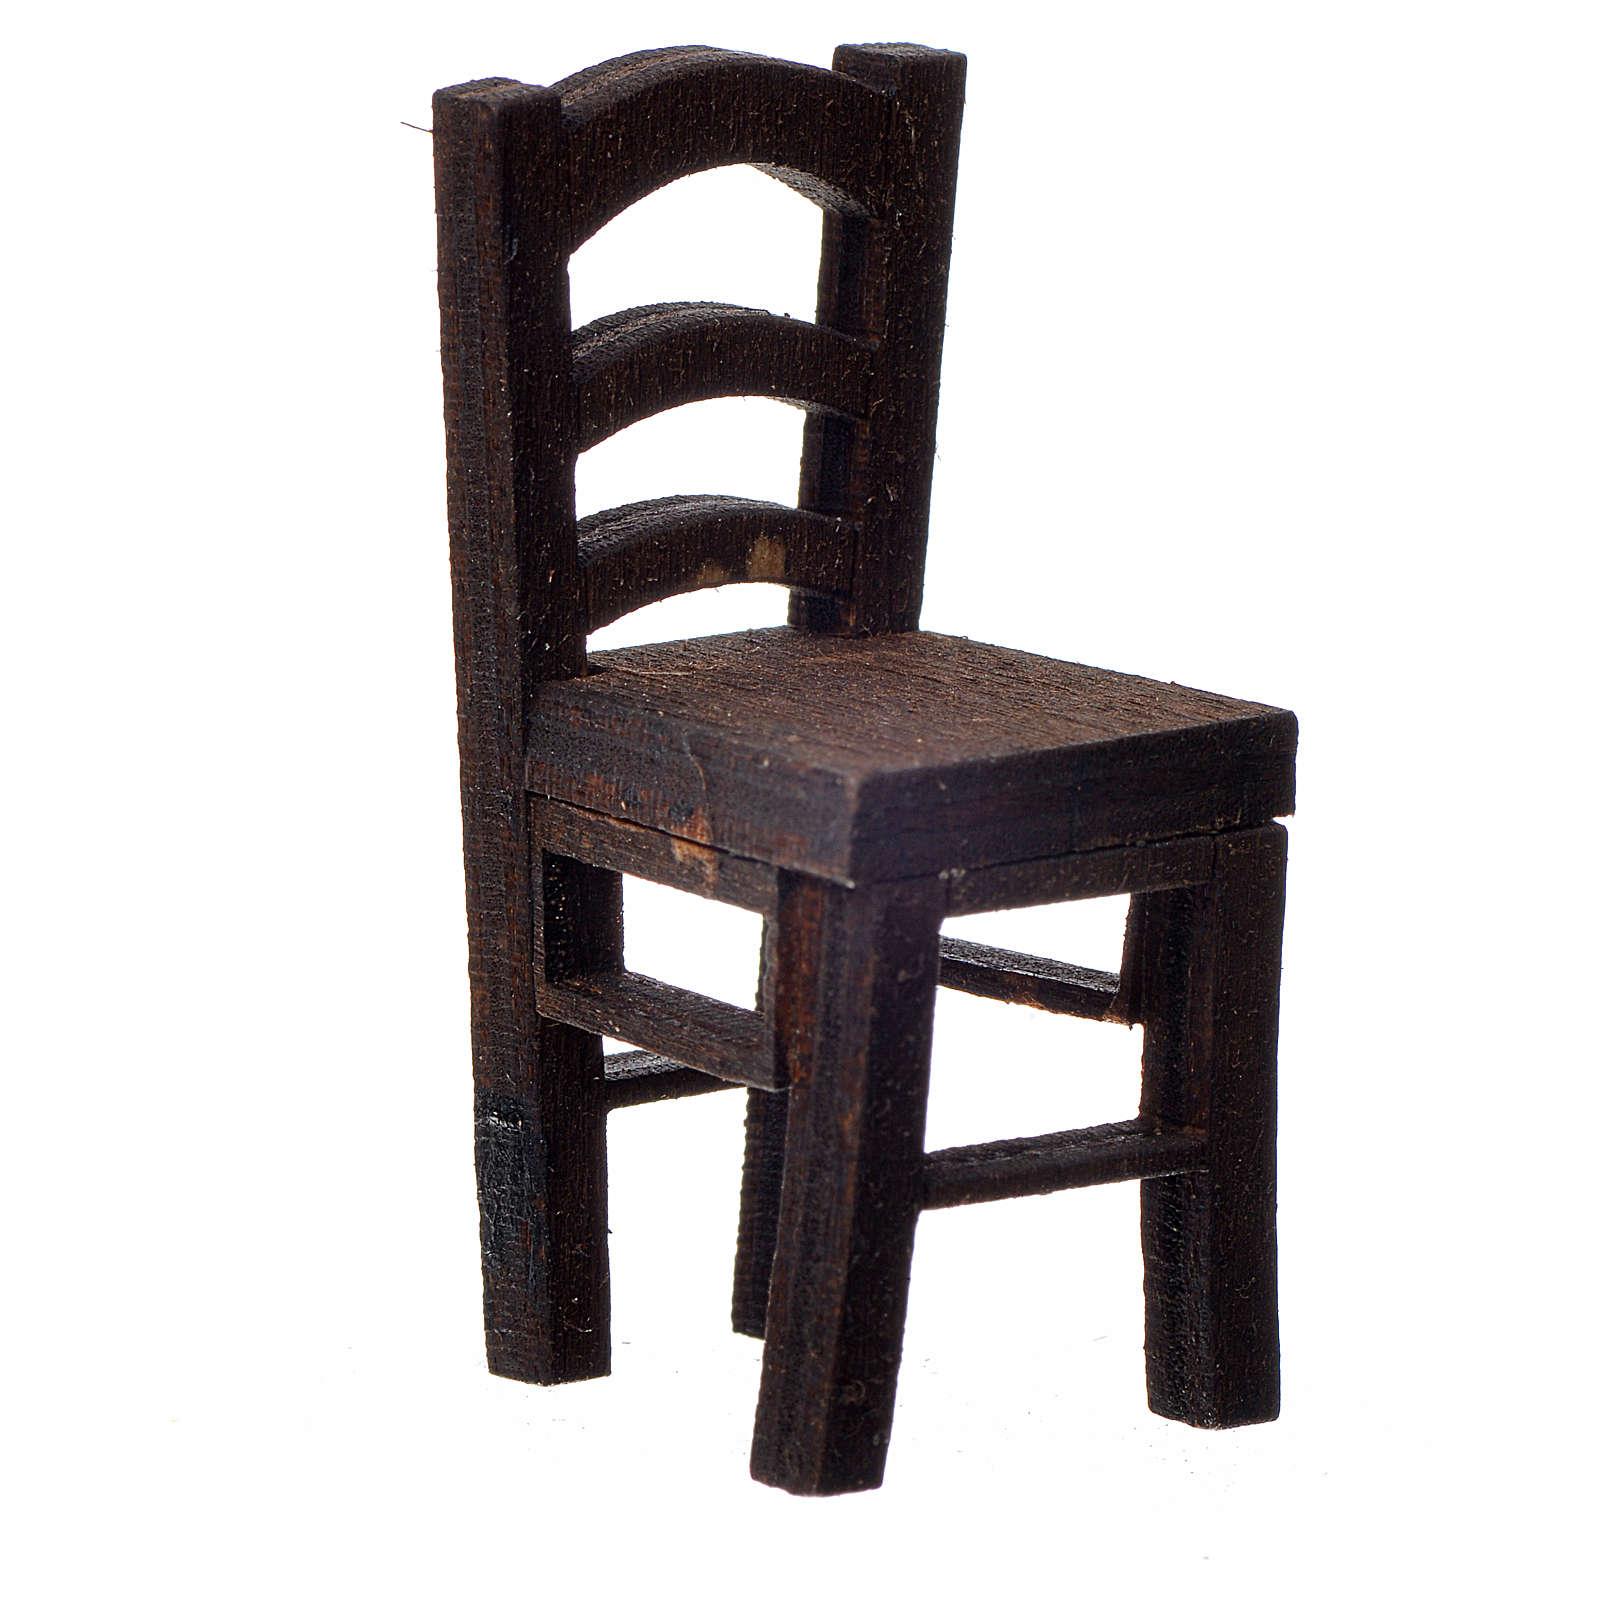 Nativity accessory, wooden chair 4x2x2cm 4